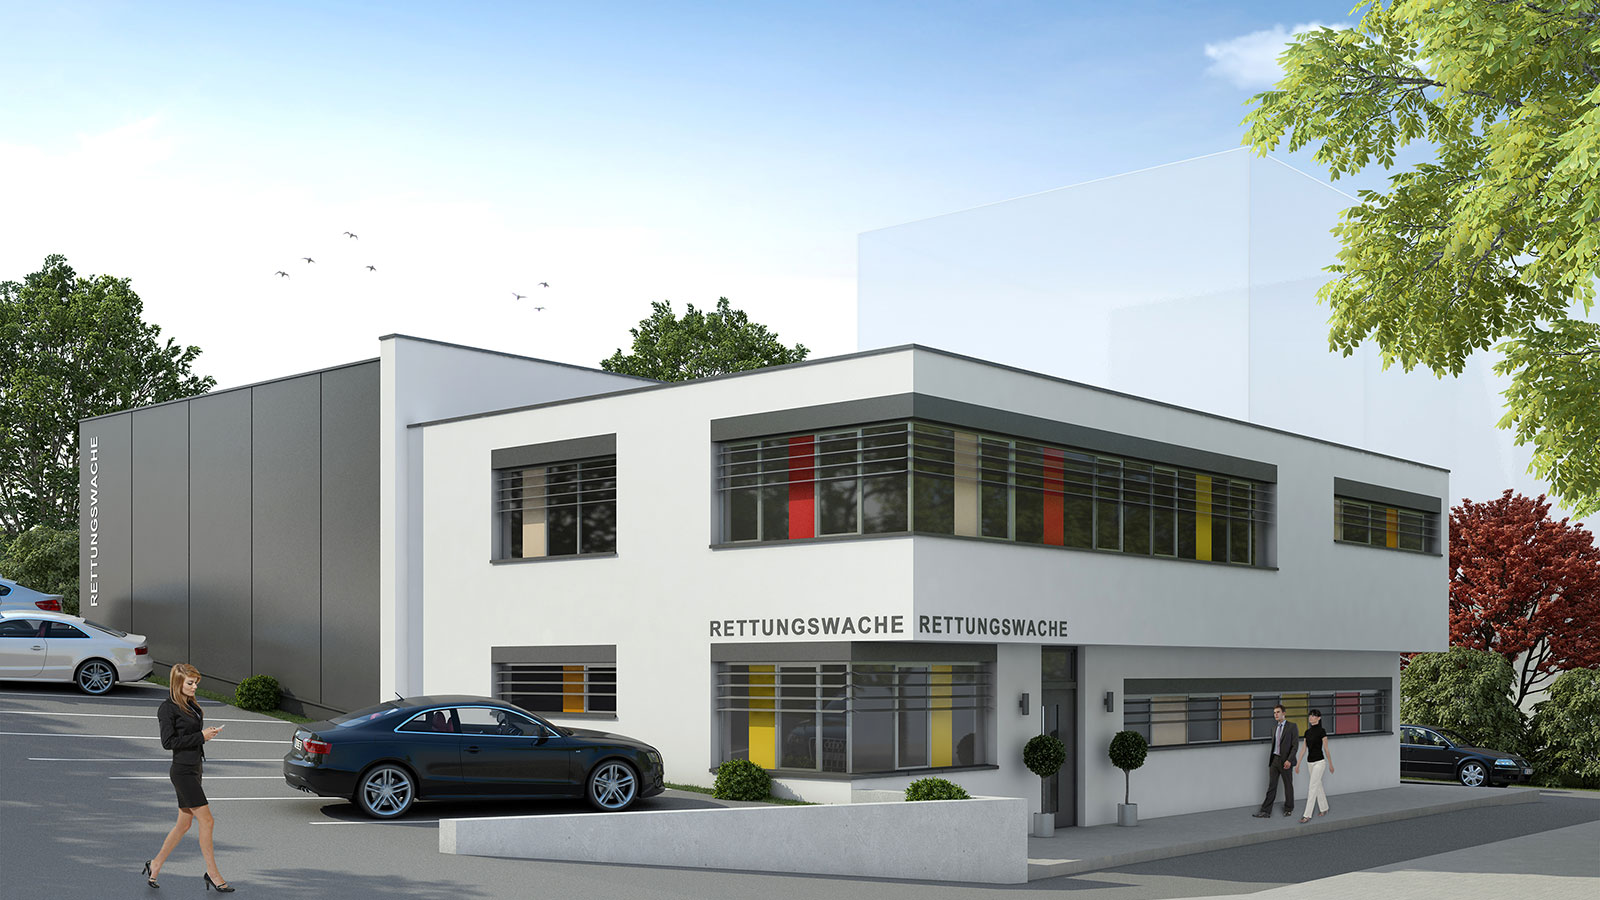 Rettungswache in Wipperfürth